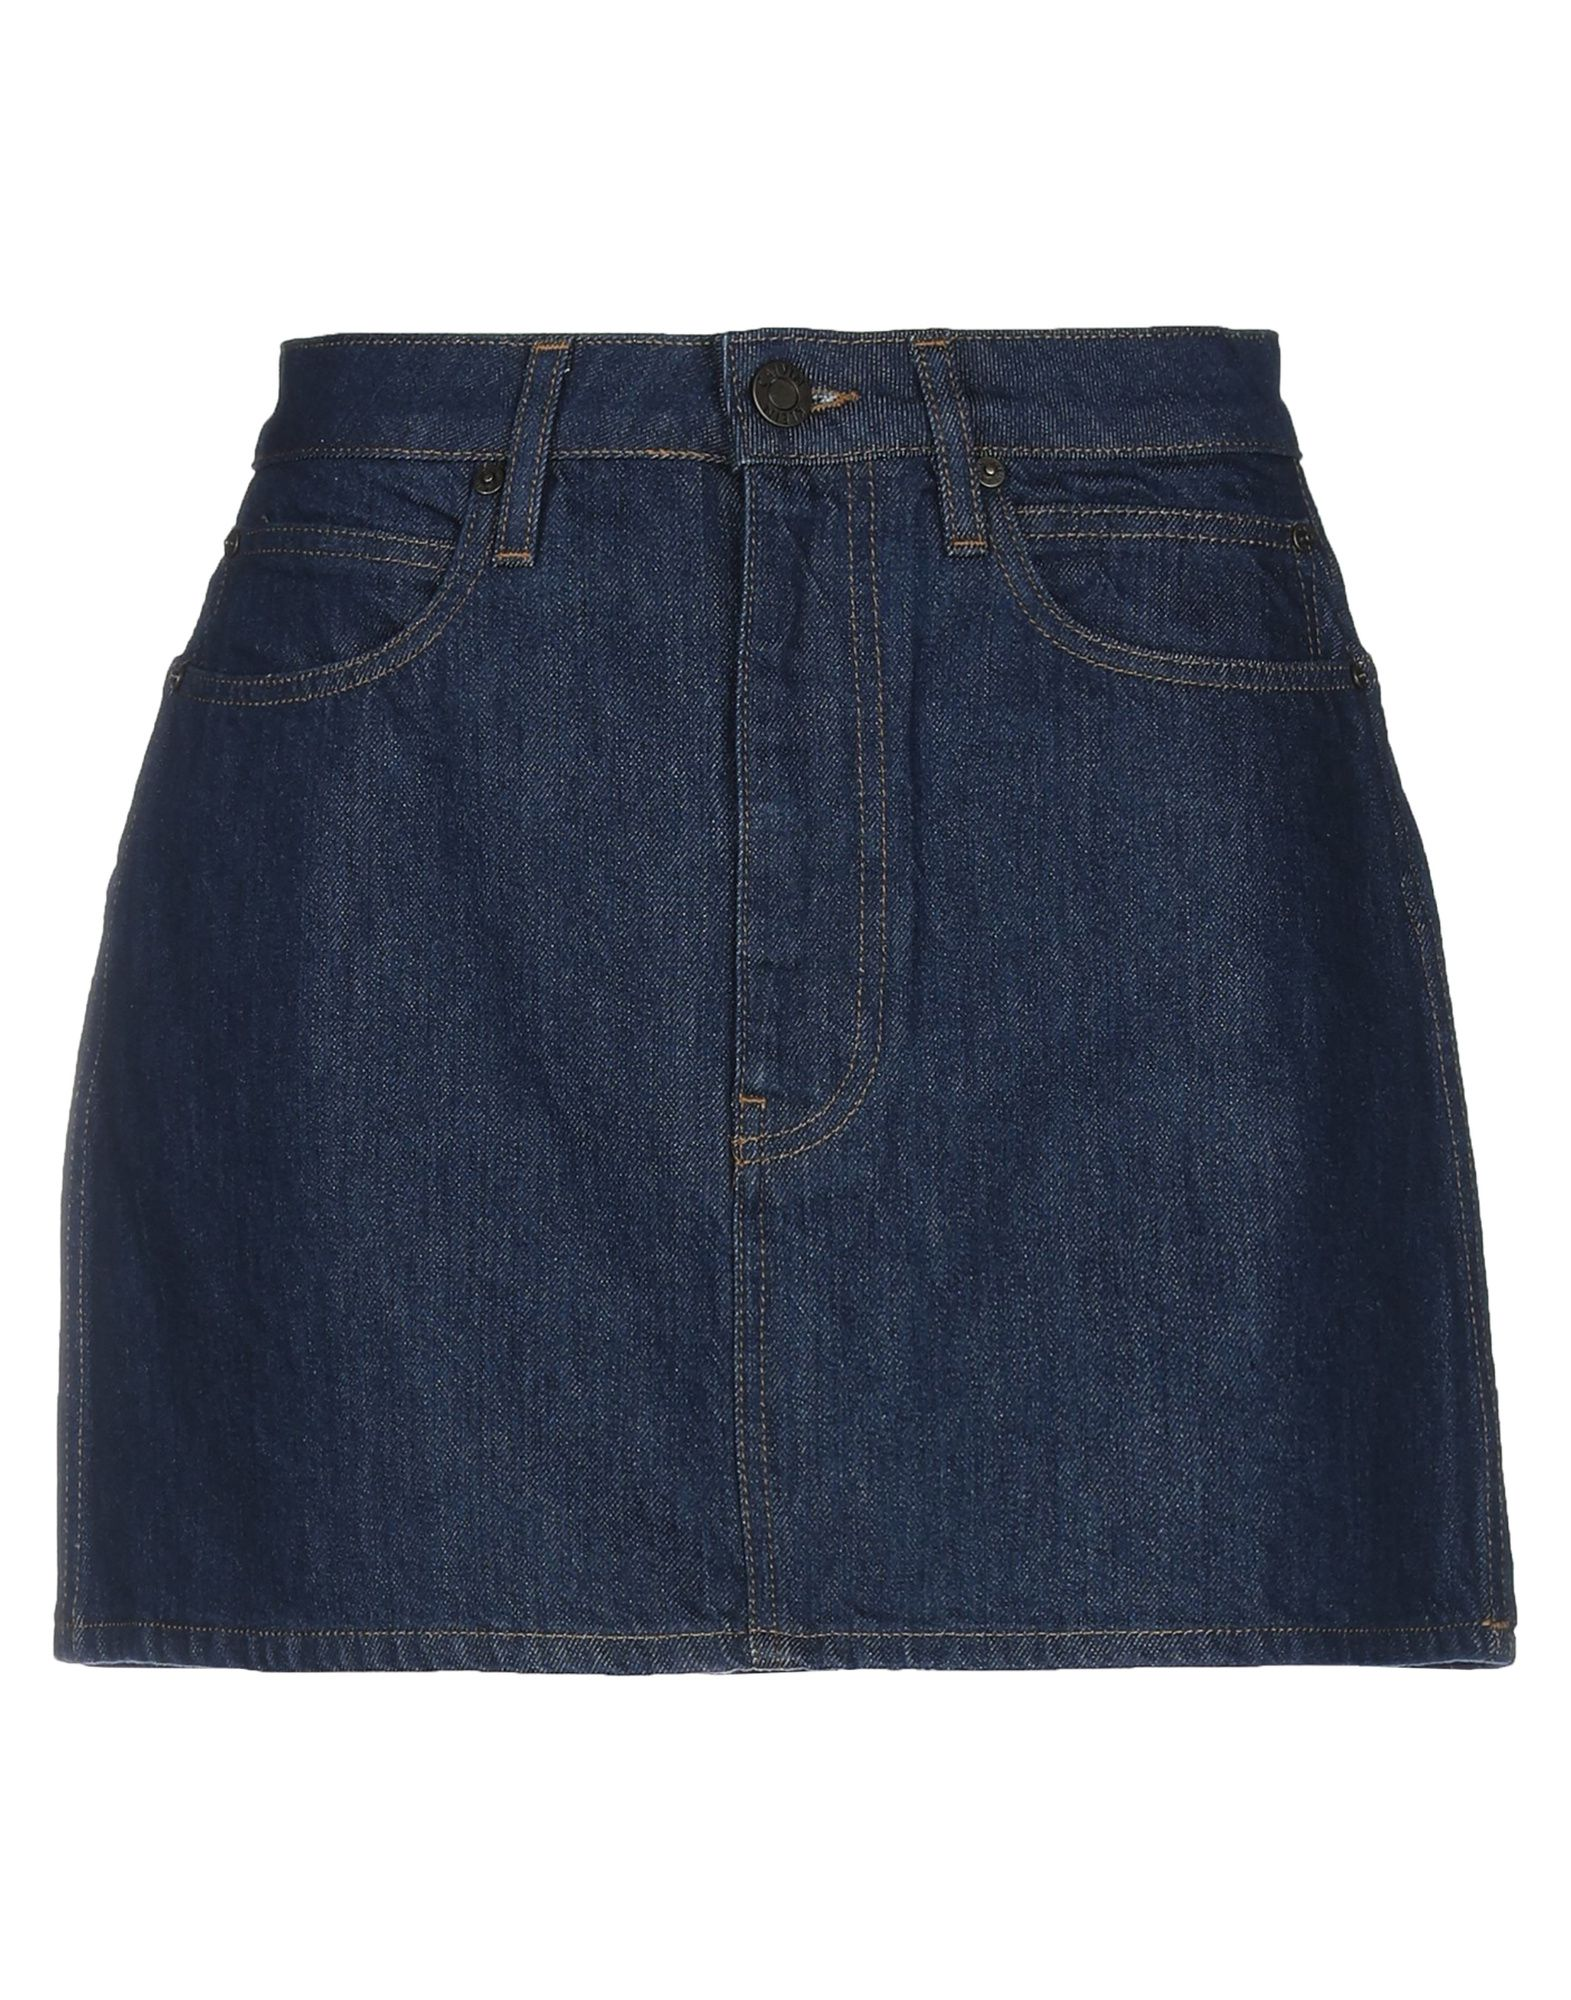 CALVIN KLEIN JEANS | CALVIN KLEIN JEANS Denim Skirts 42739836 | Goxip